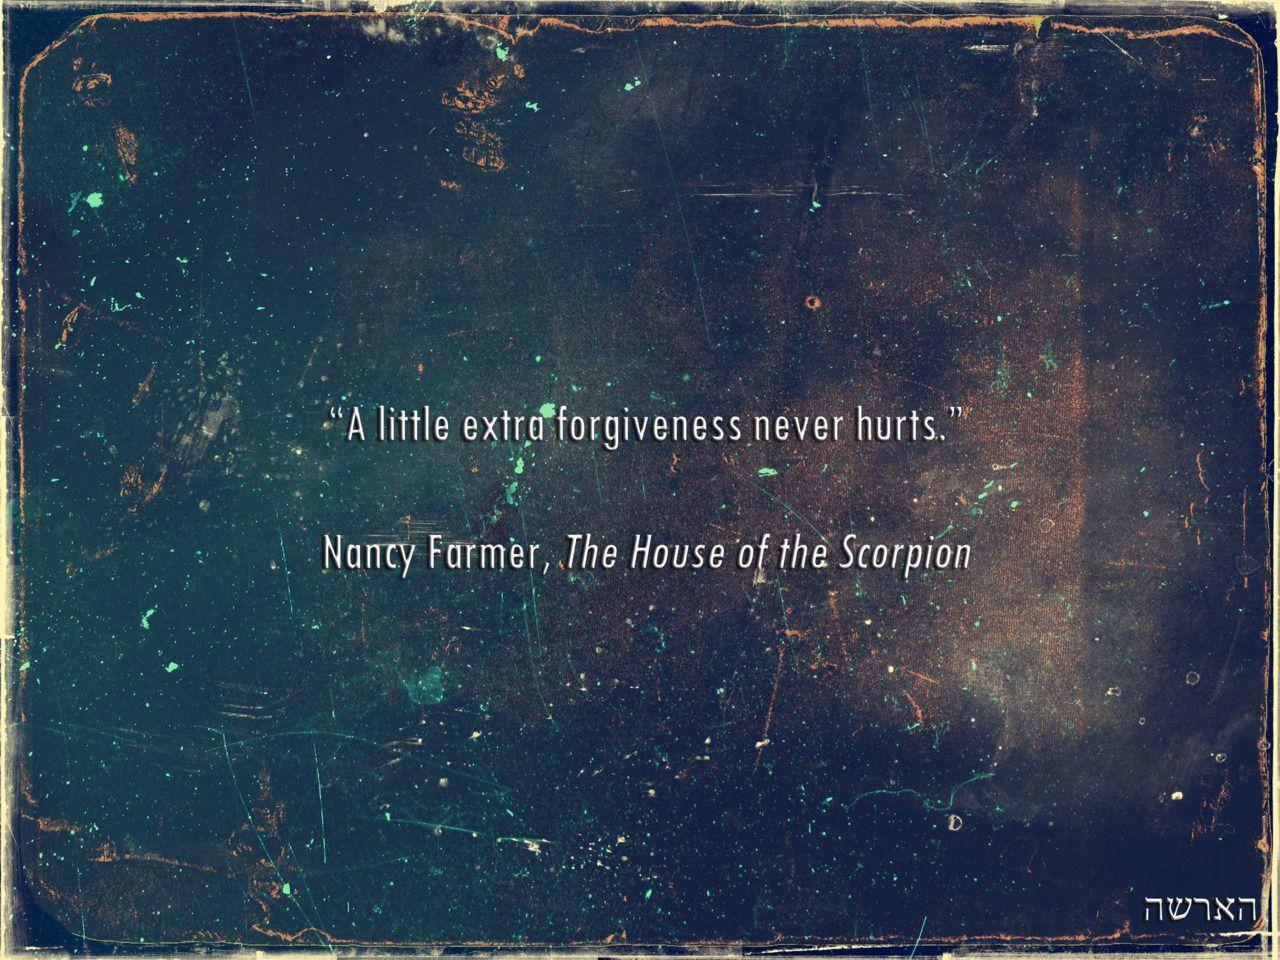 Matt One Of My Favorite Lines The House Of The Scorpion Nancy Farmer Grateful Dead Quotes Dead Quote Grateful Dead Lyrics